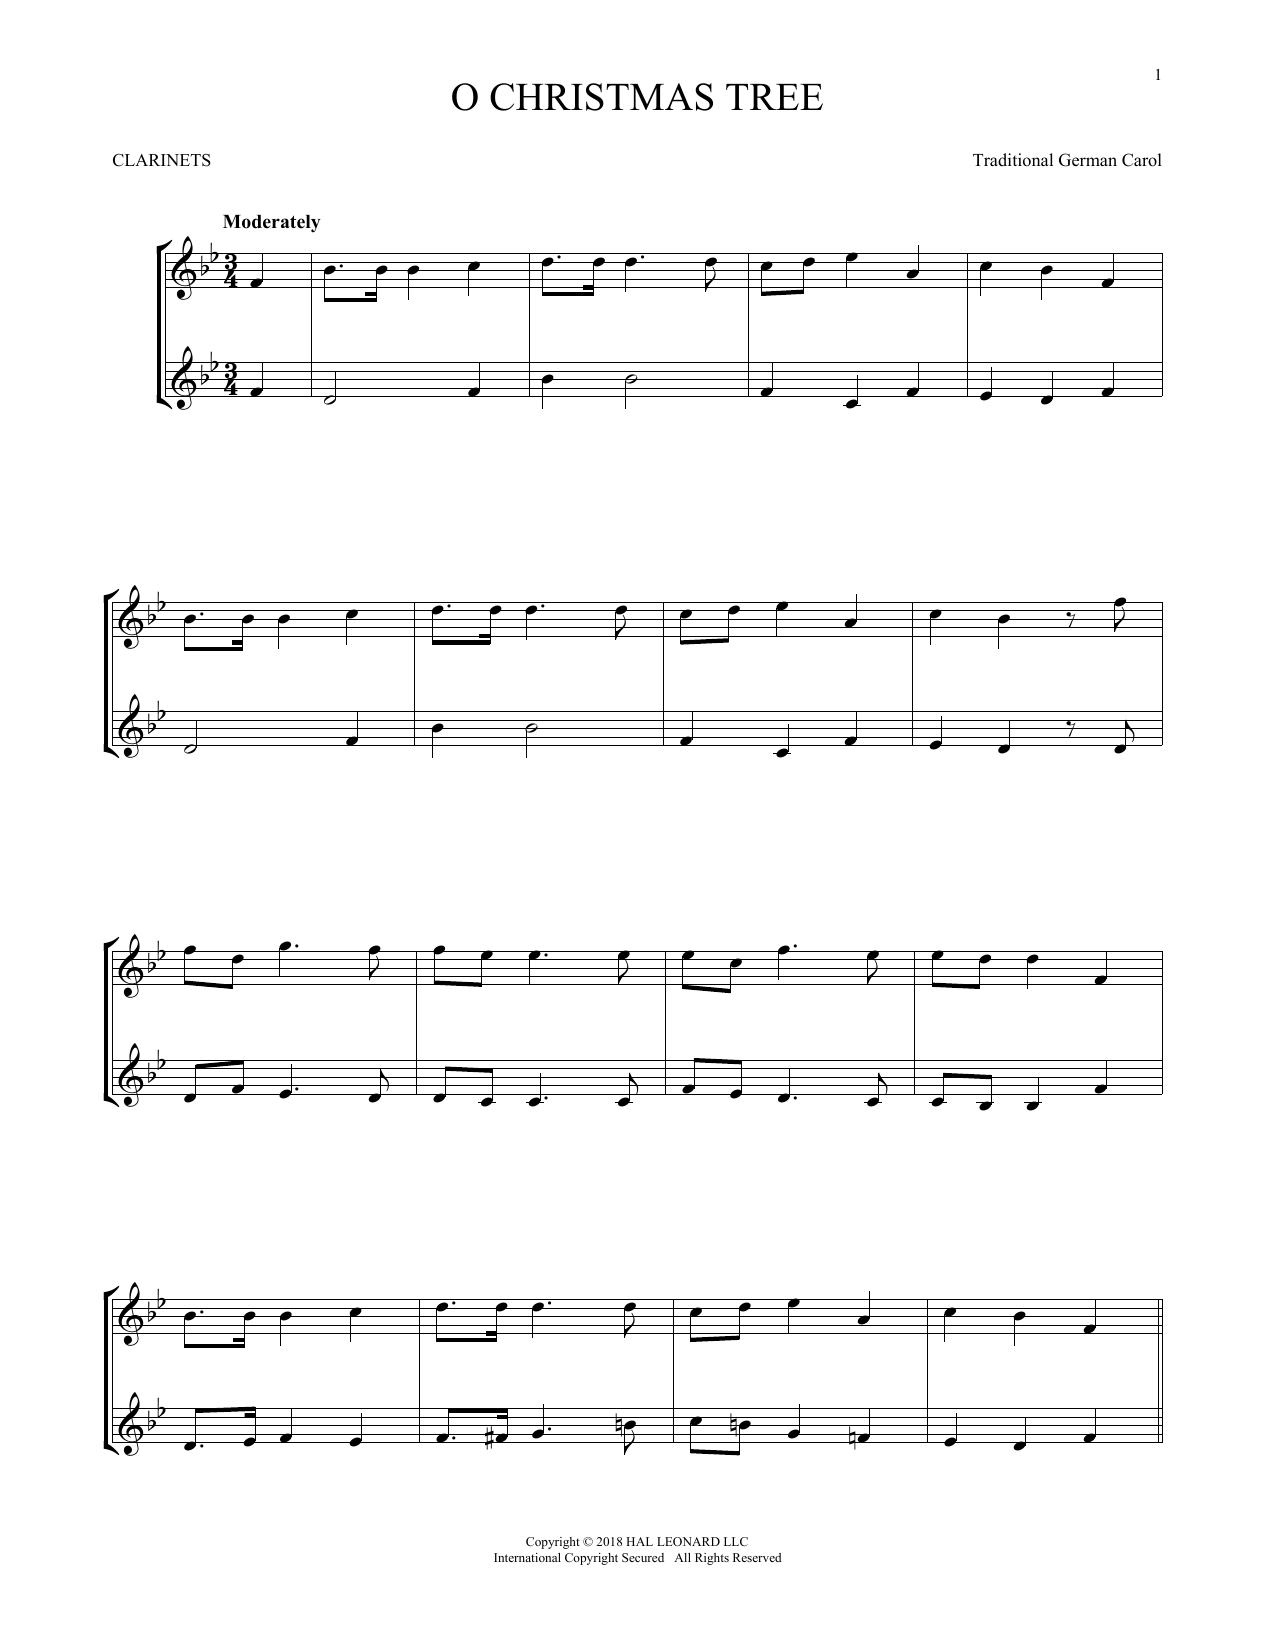 O Christmas Tree (Clarinet Duet)